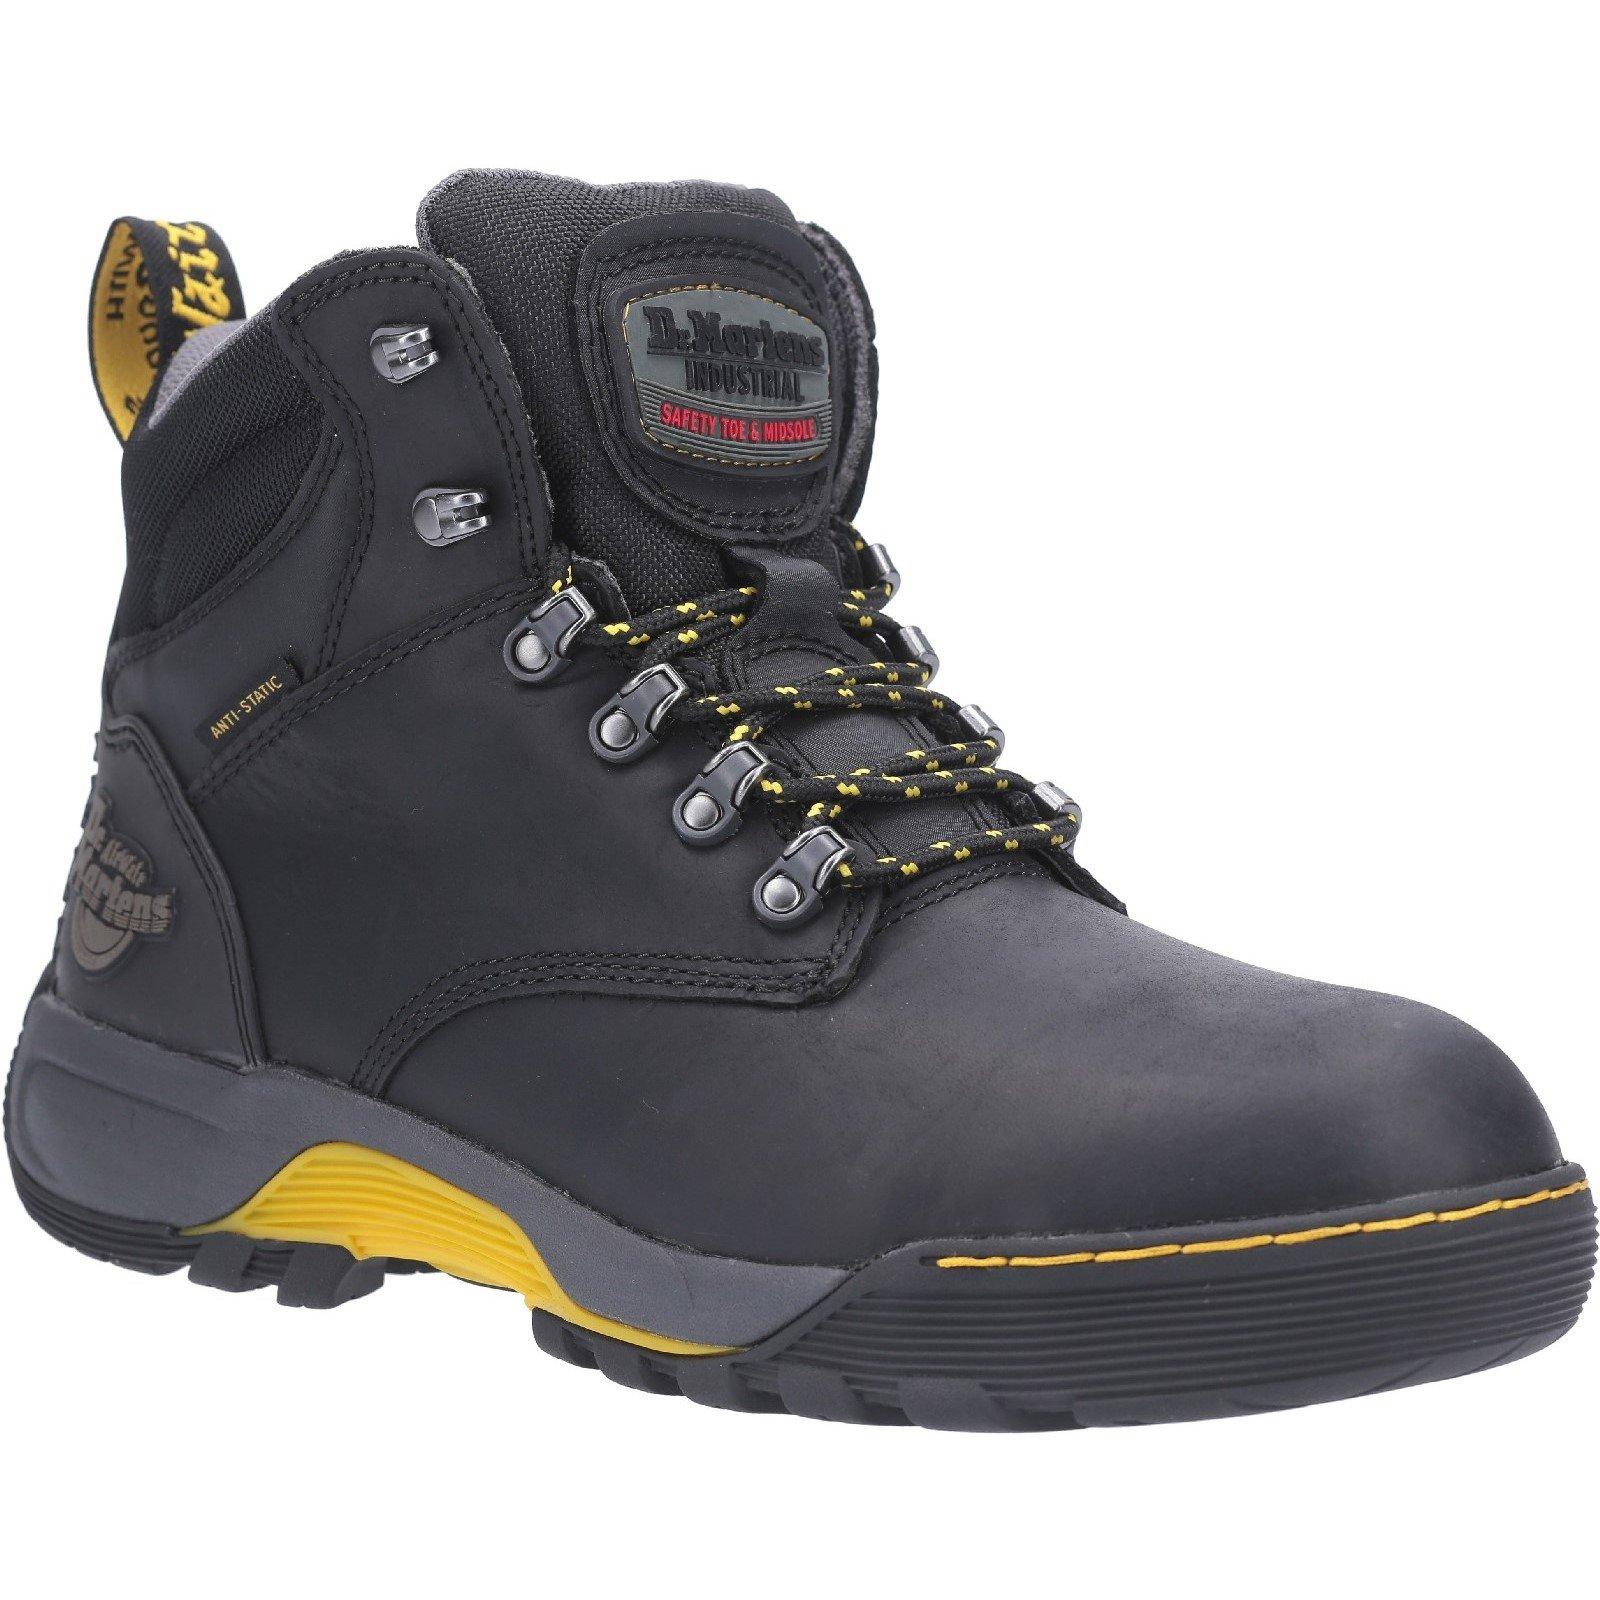 Dr Martens Unisex Ridge ST Lace Up Hiker Safety Boot Black 28324 - Black 11